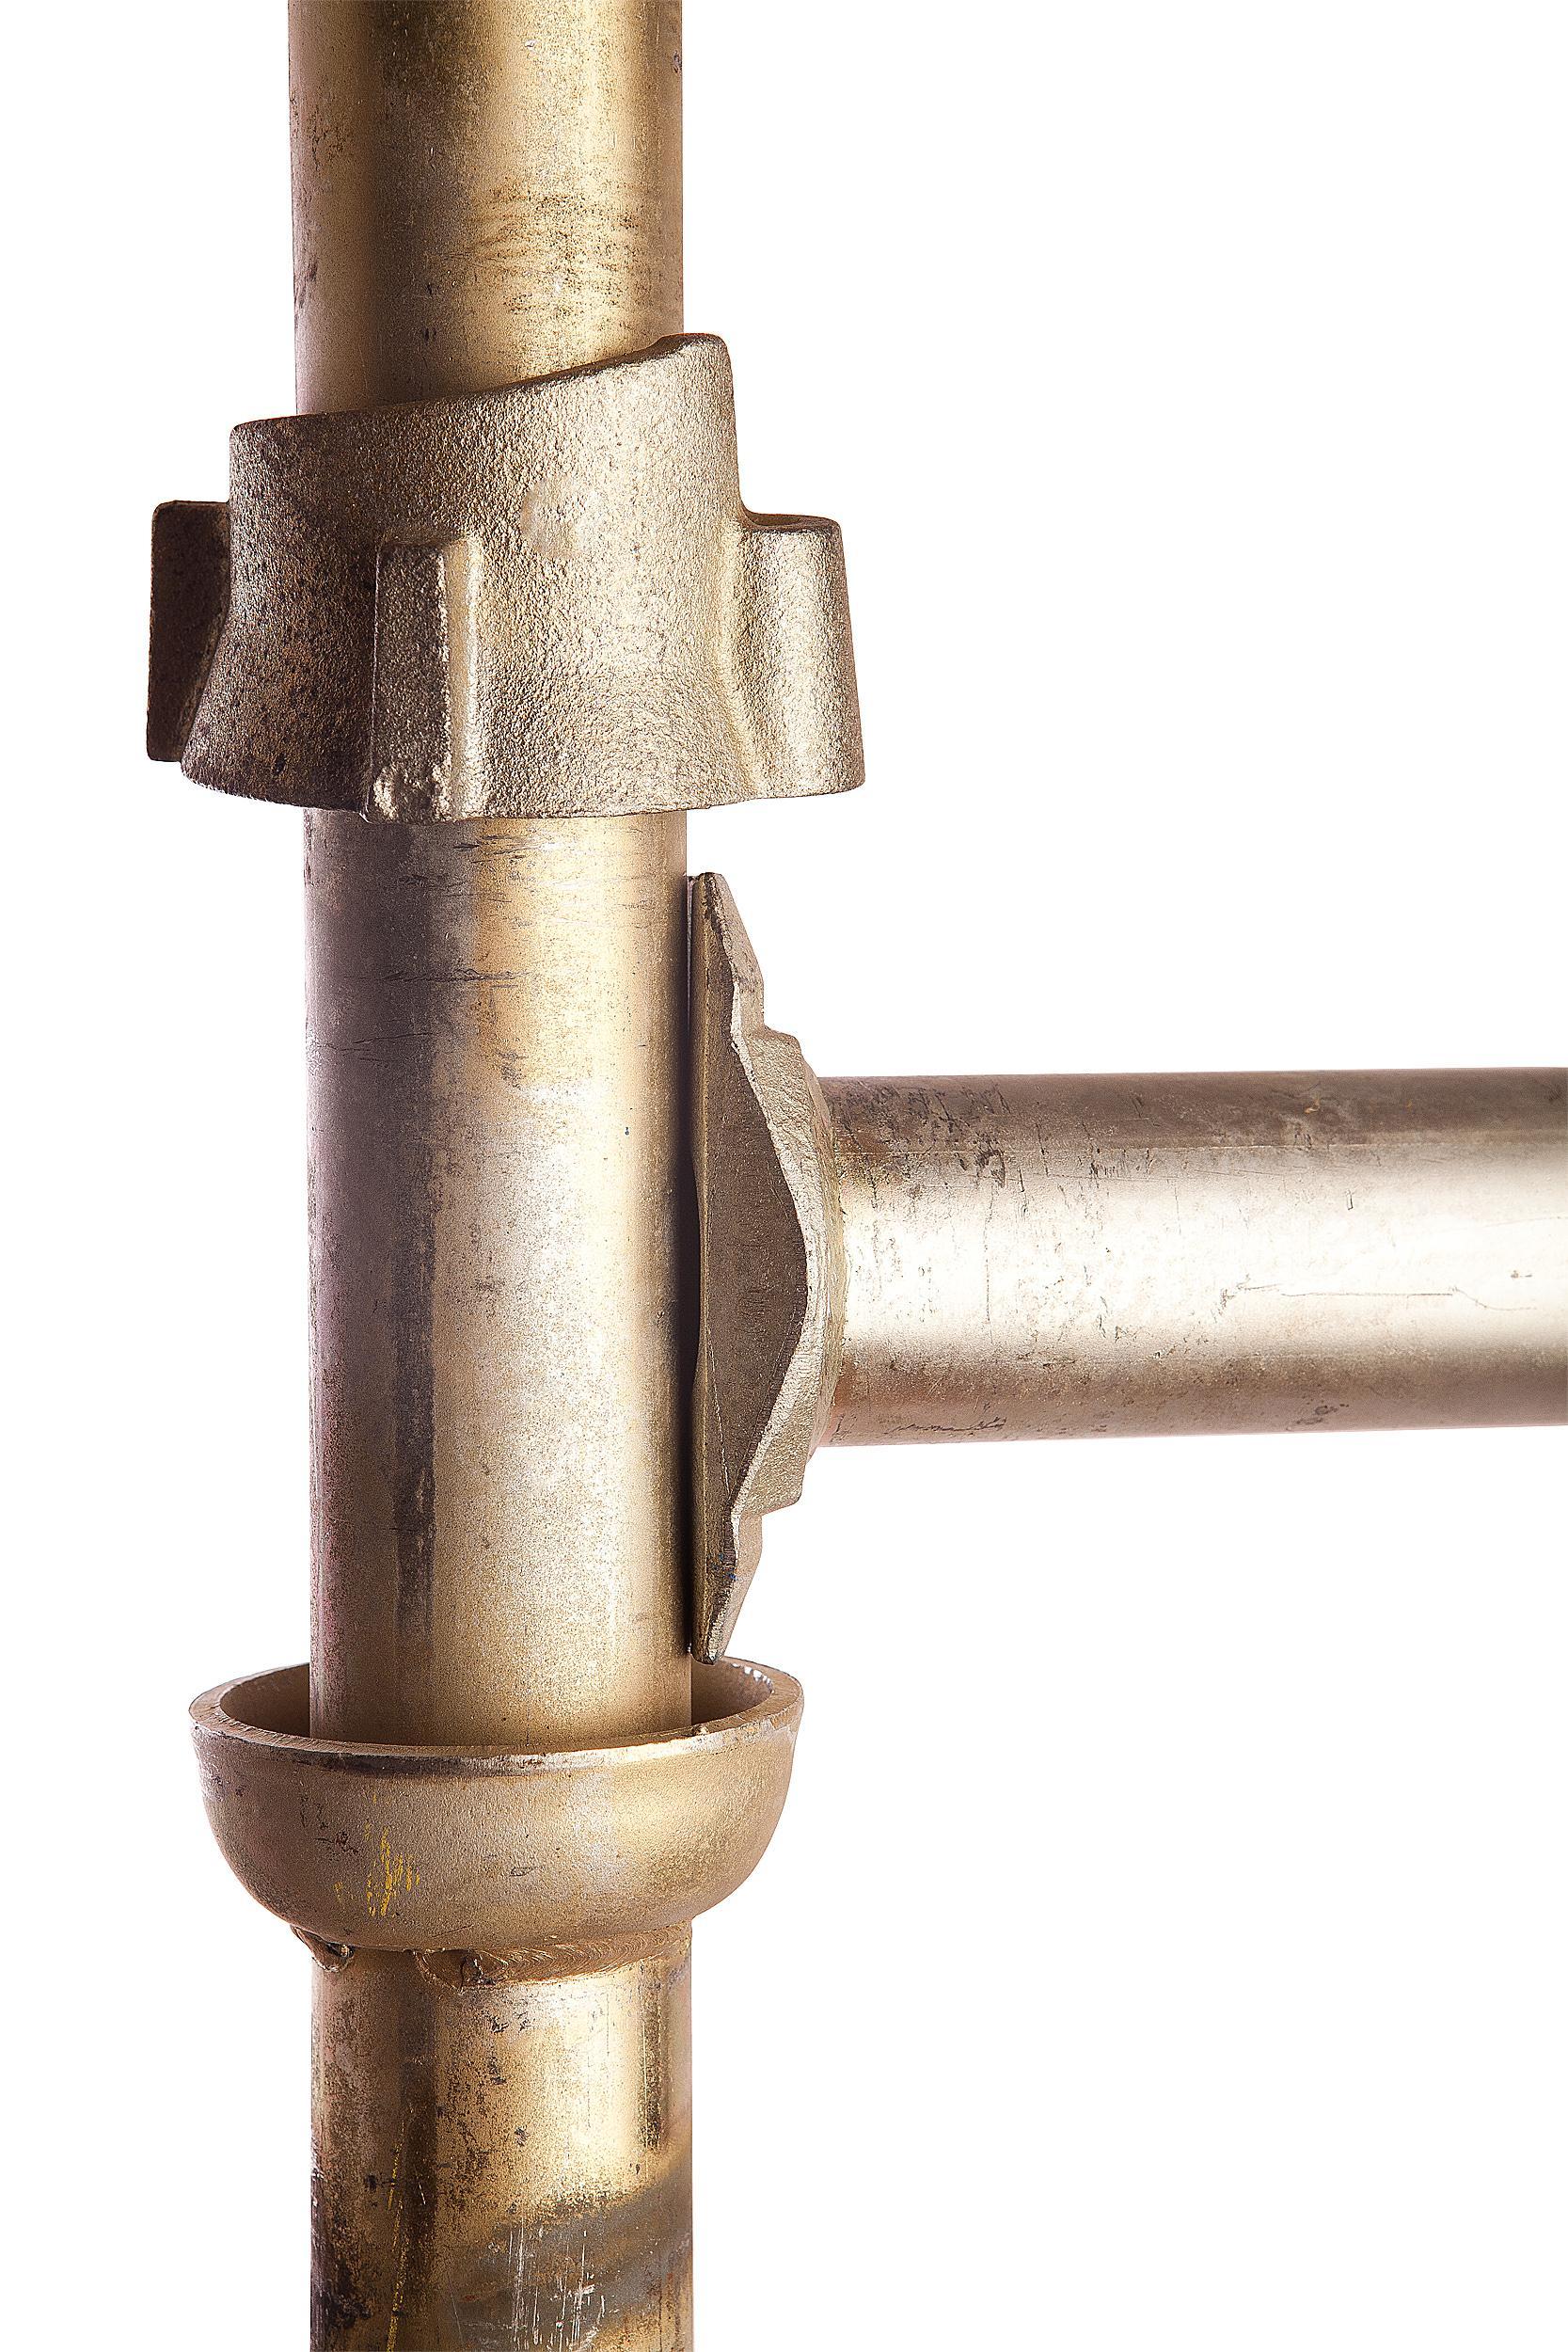 6adb84b7 4f66 44af 8c25 f3eb6ceadc39 image large - Аренда опалубки Cup-Lock. Объемная рамная опалубка КапЛок